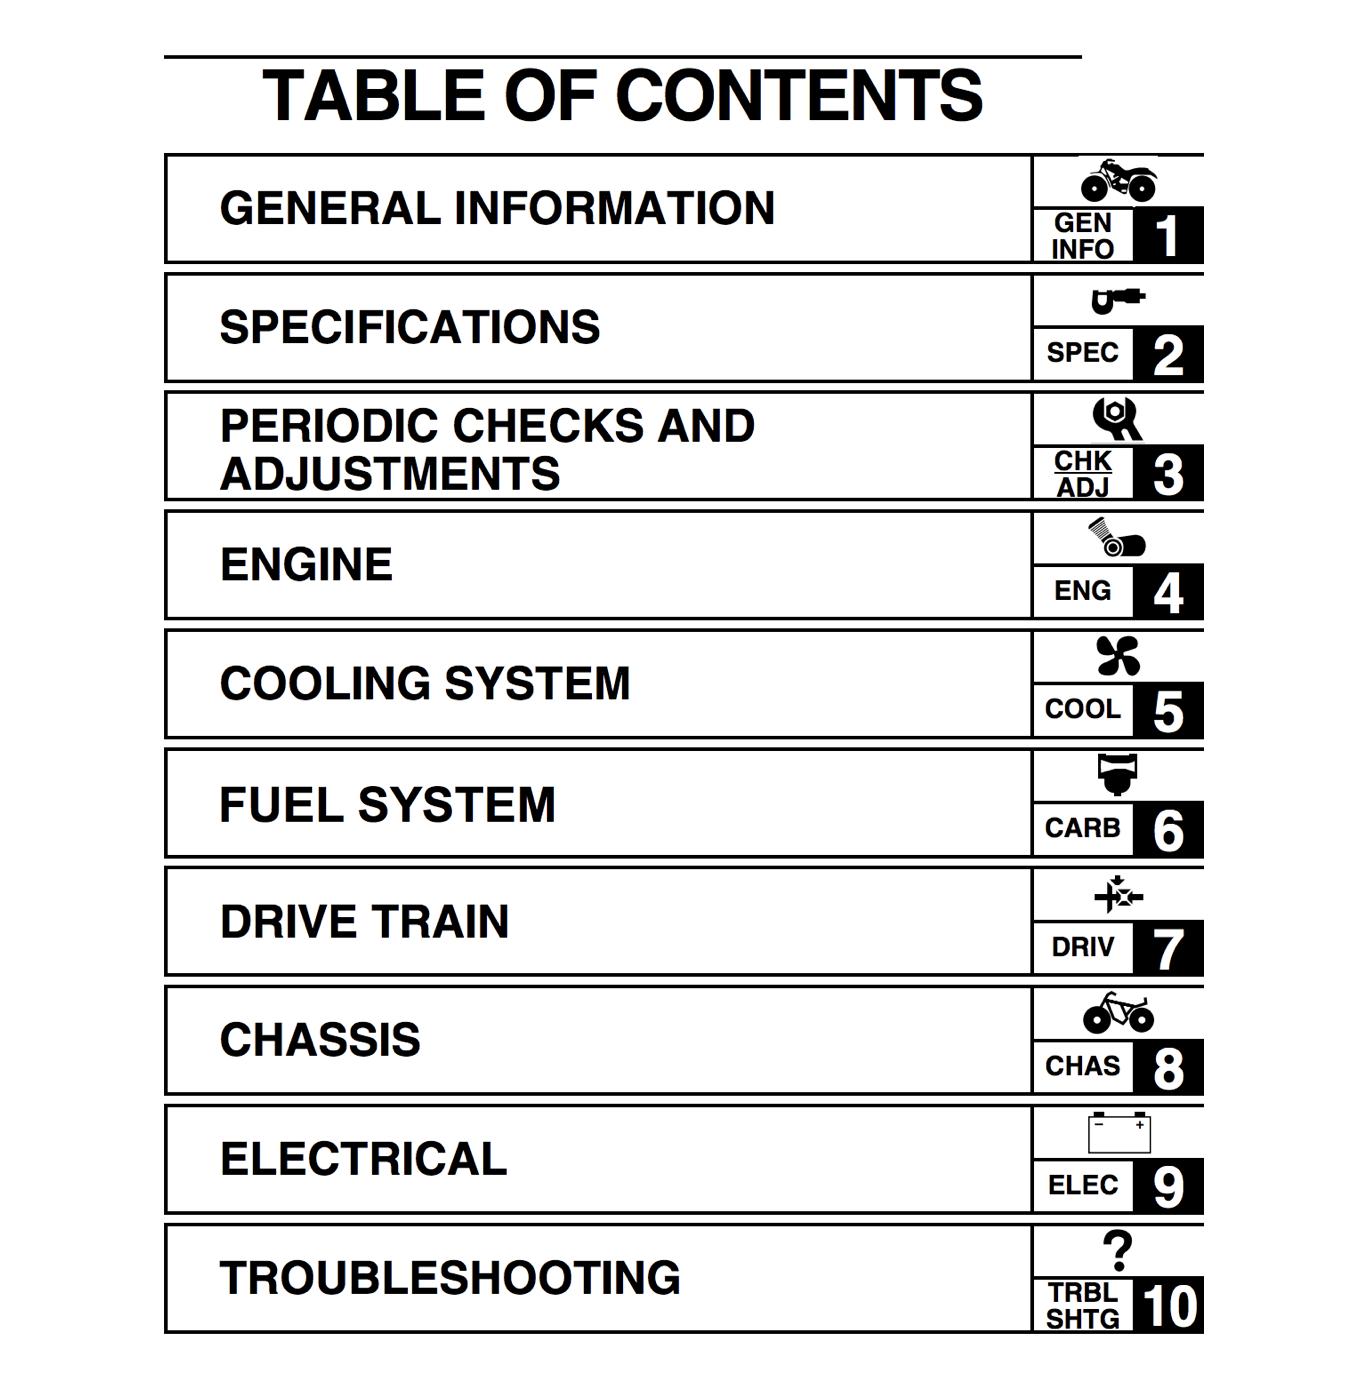 Polaris Ranger 900 Service Manual Chapters